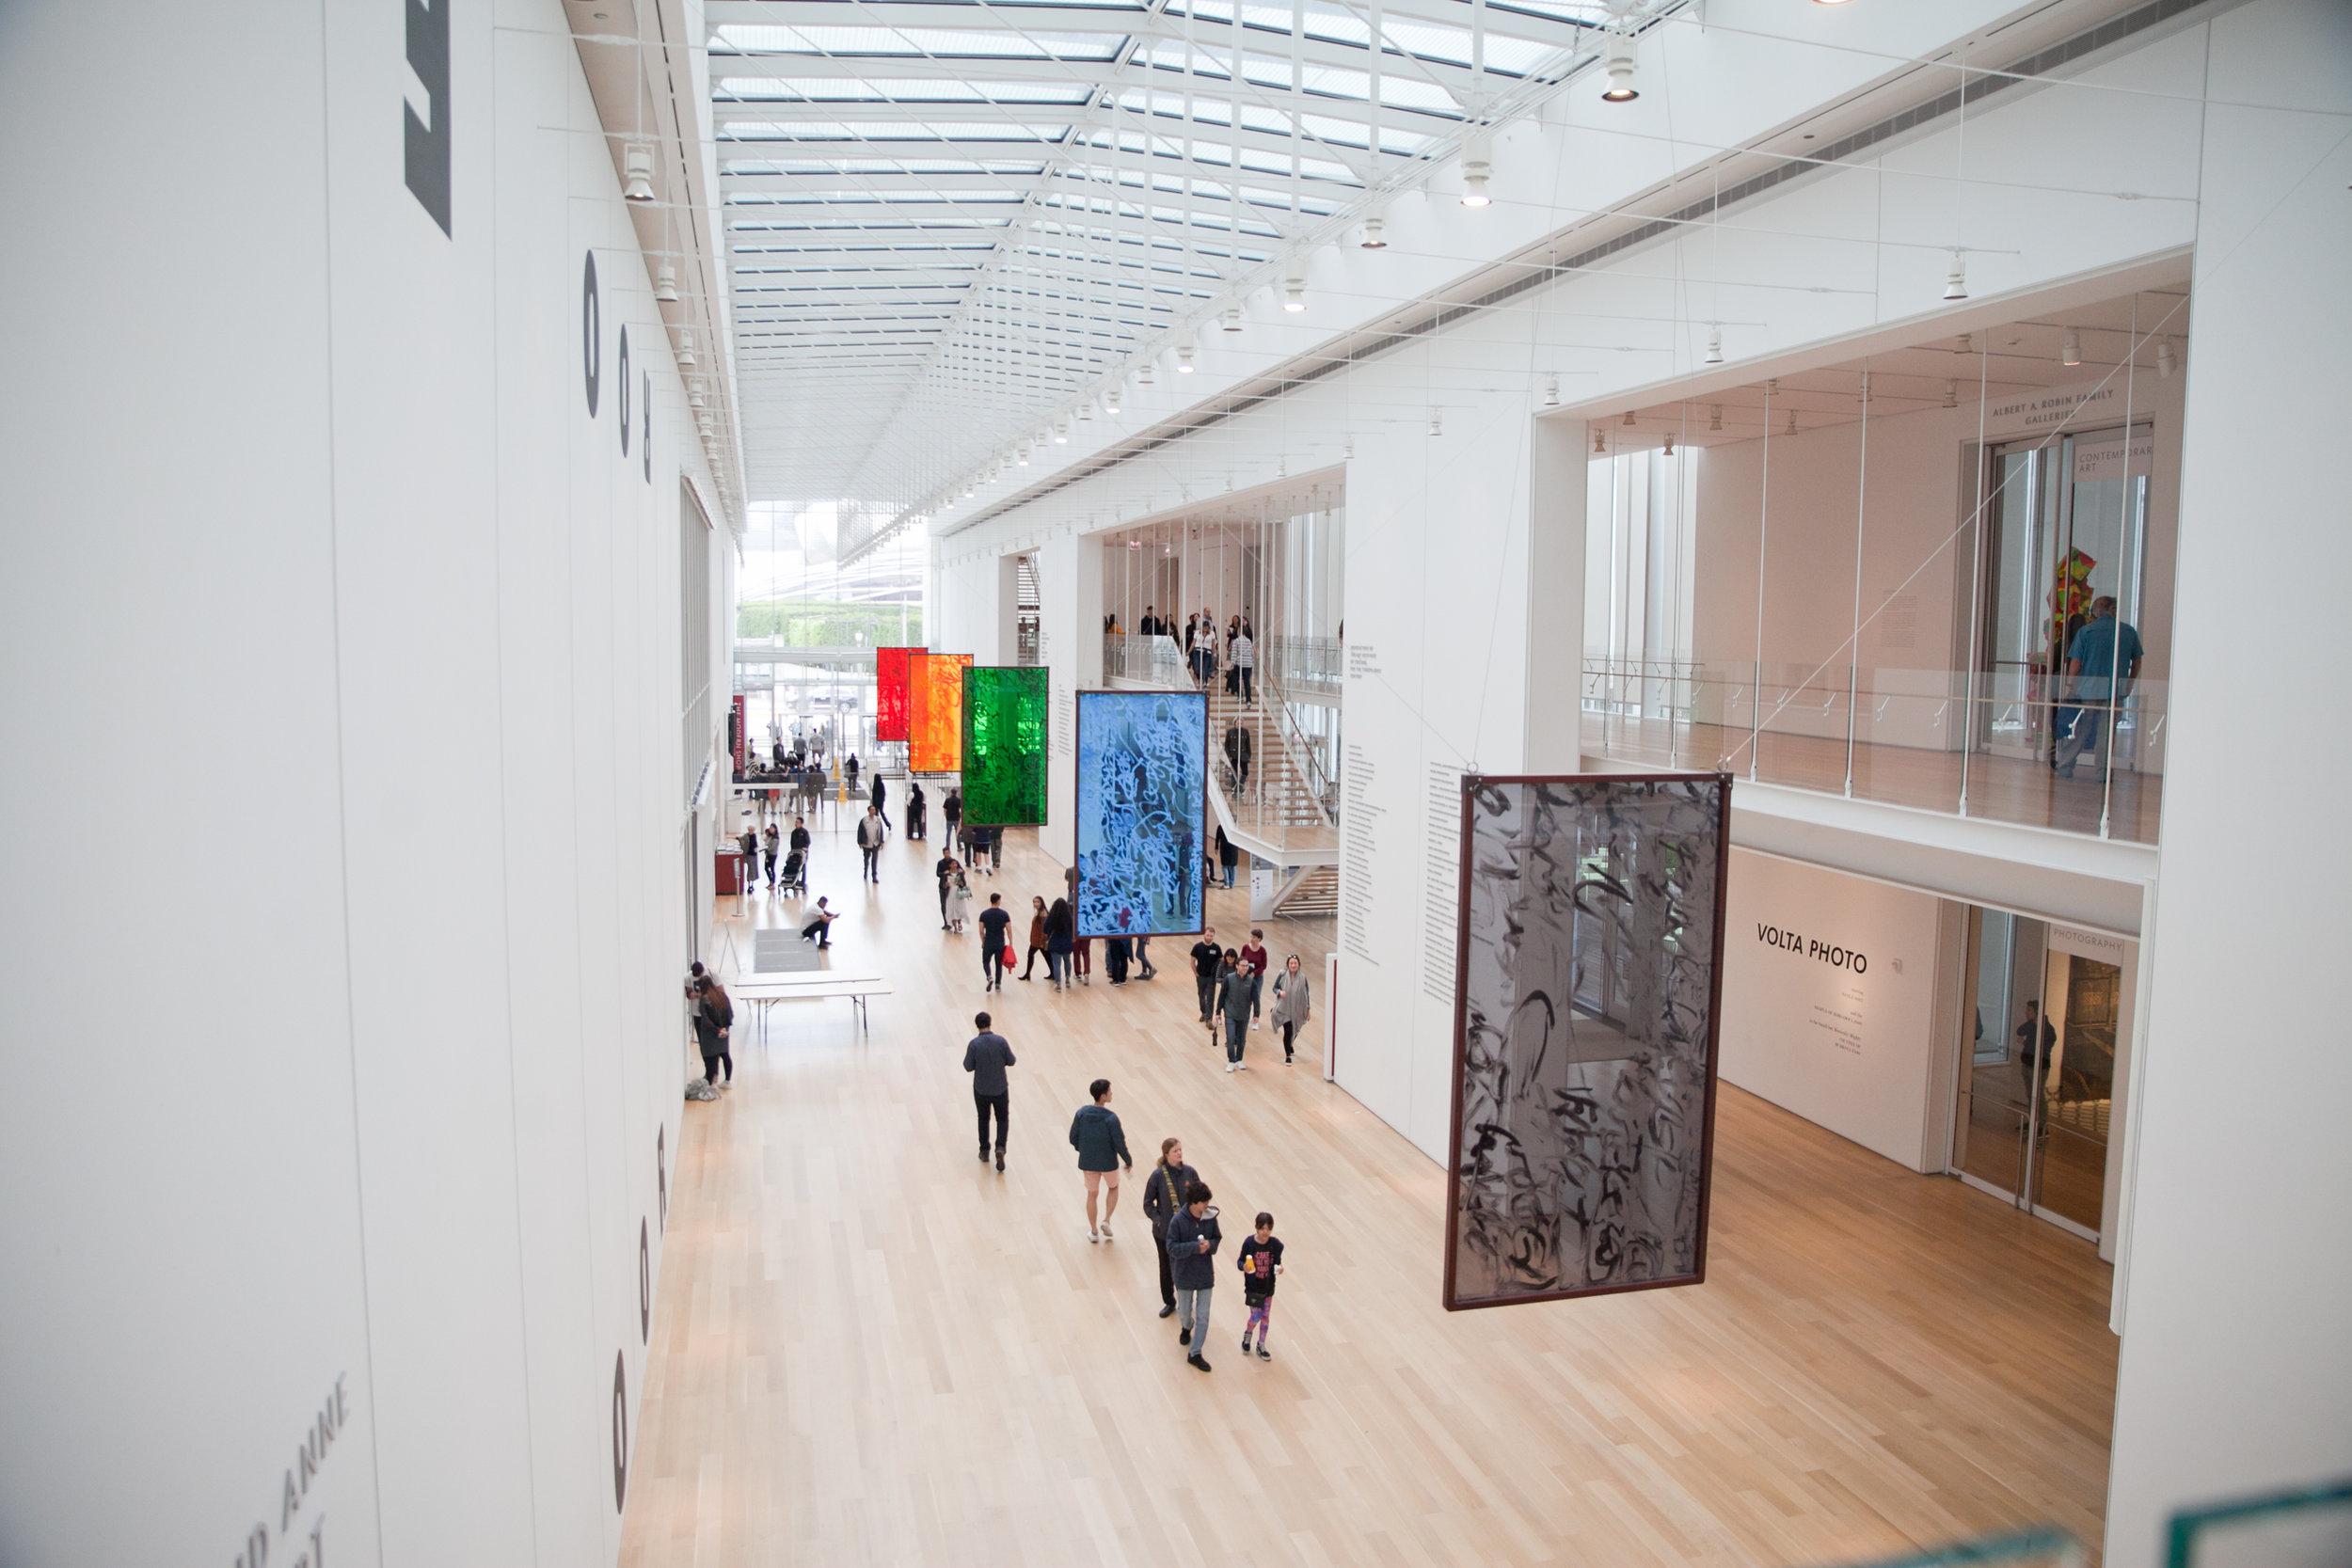 interior shot of the chicago art museum